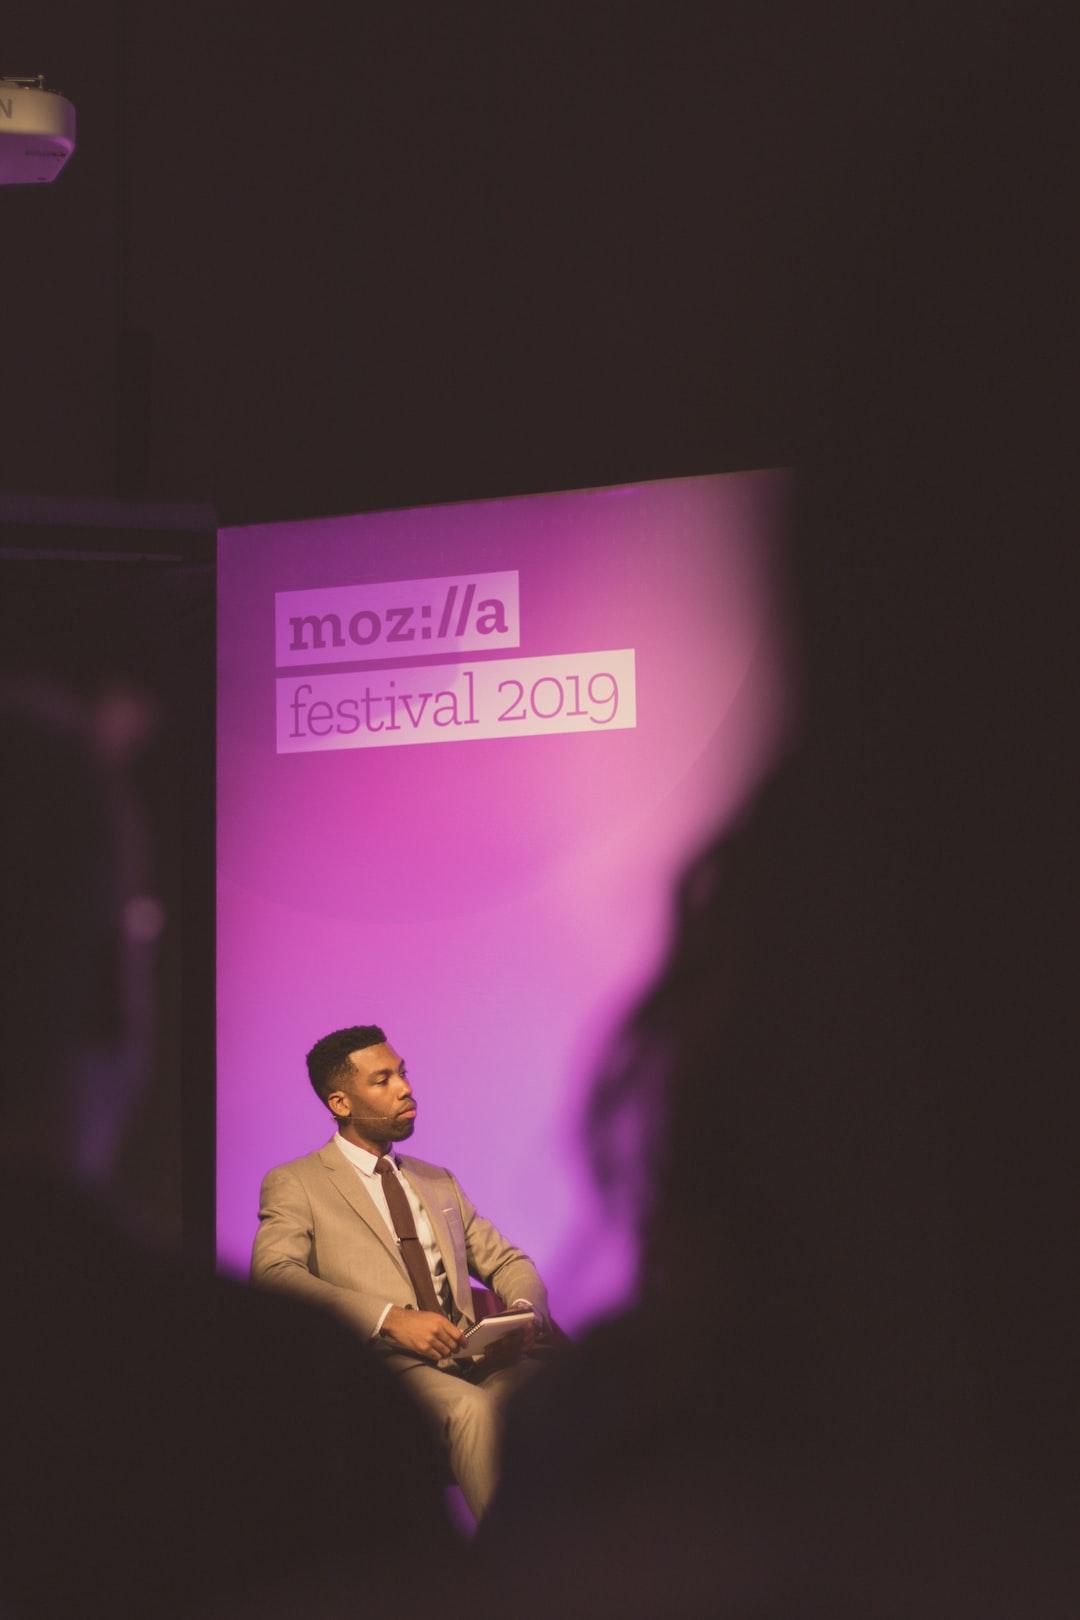 Panel moderator at Mozfest 2019.